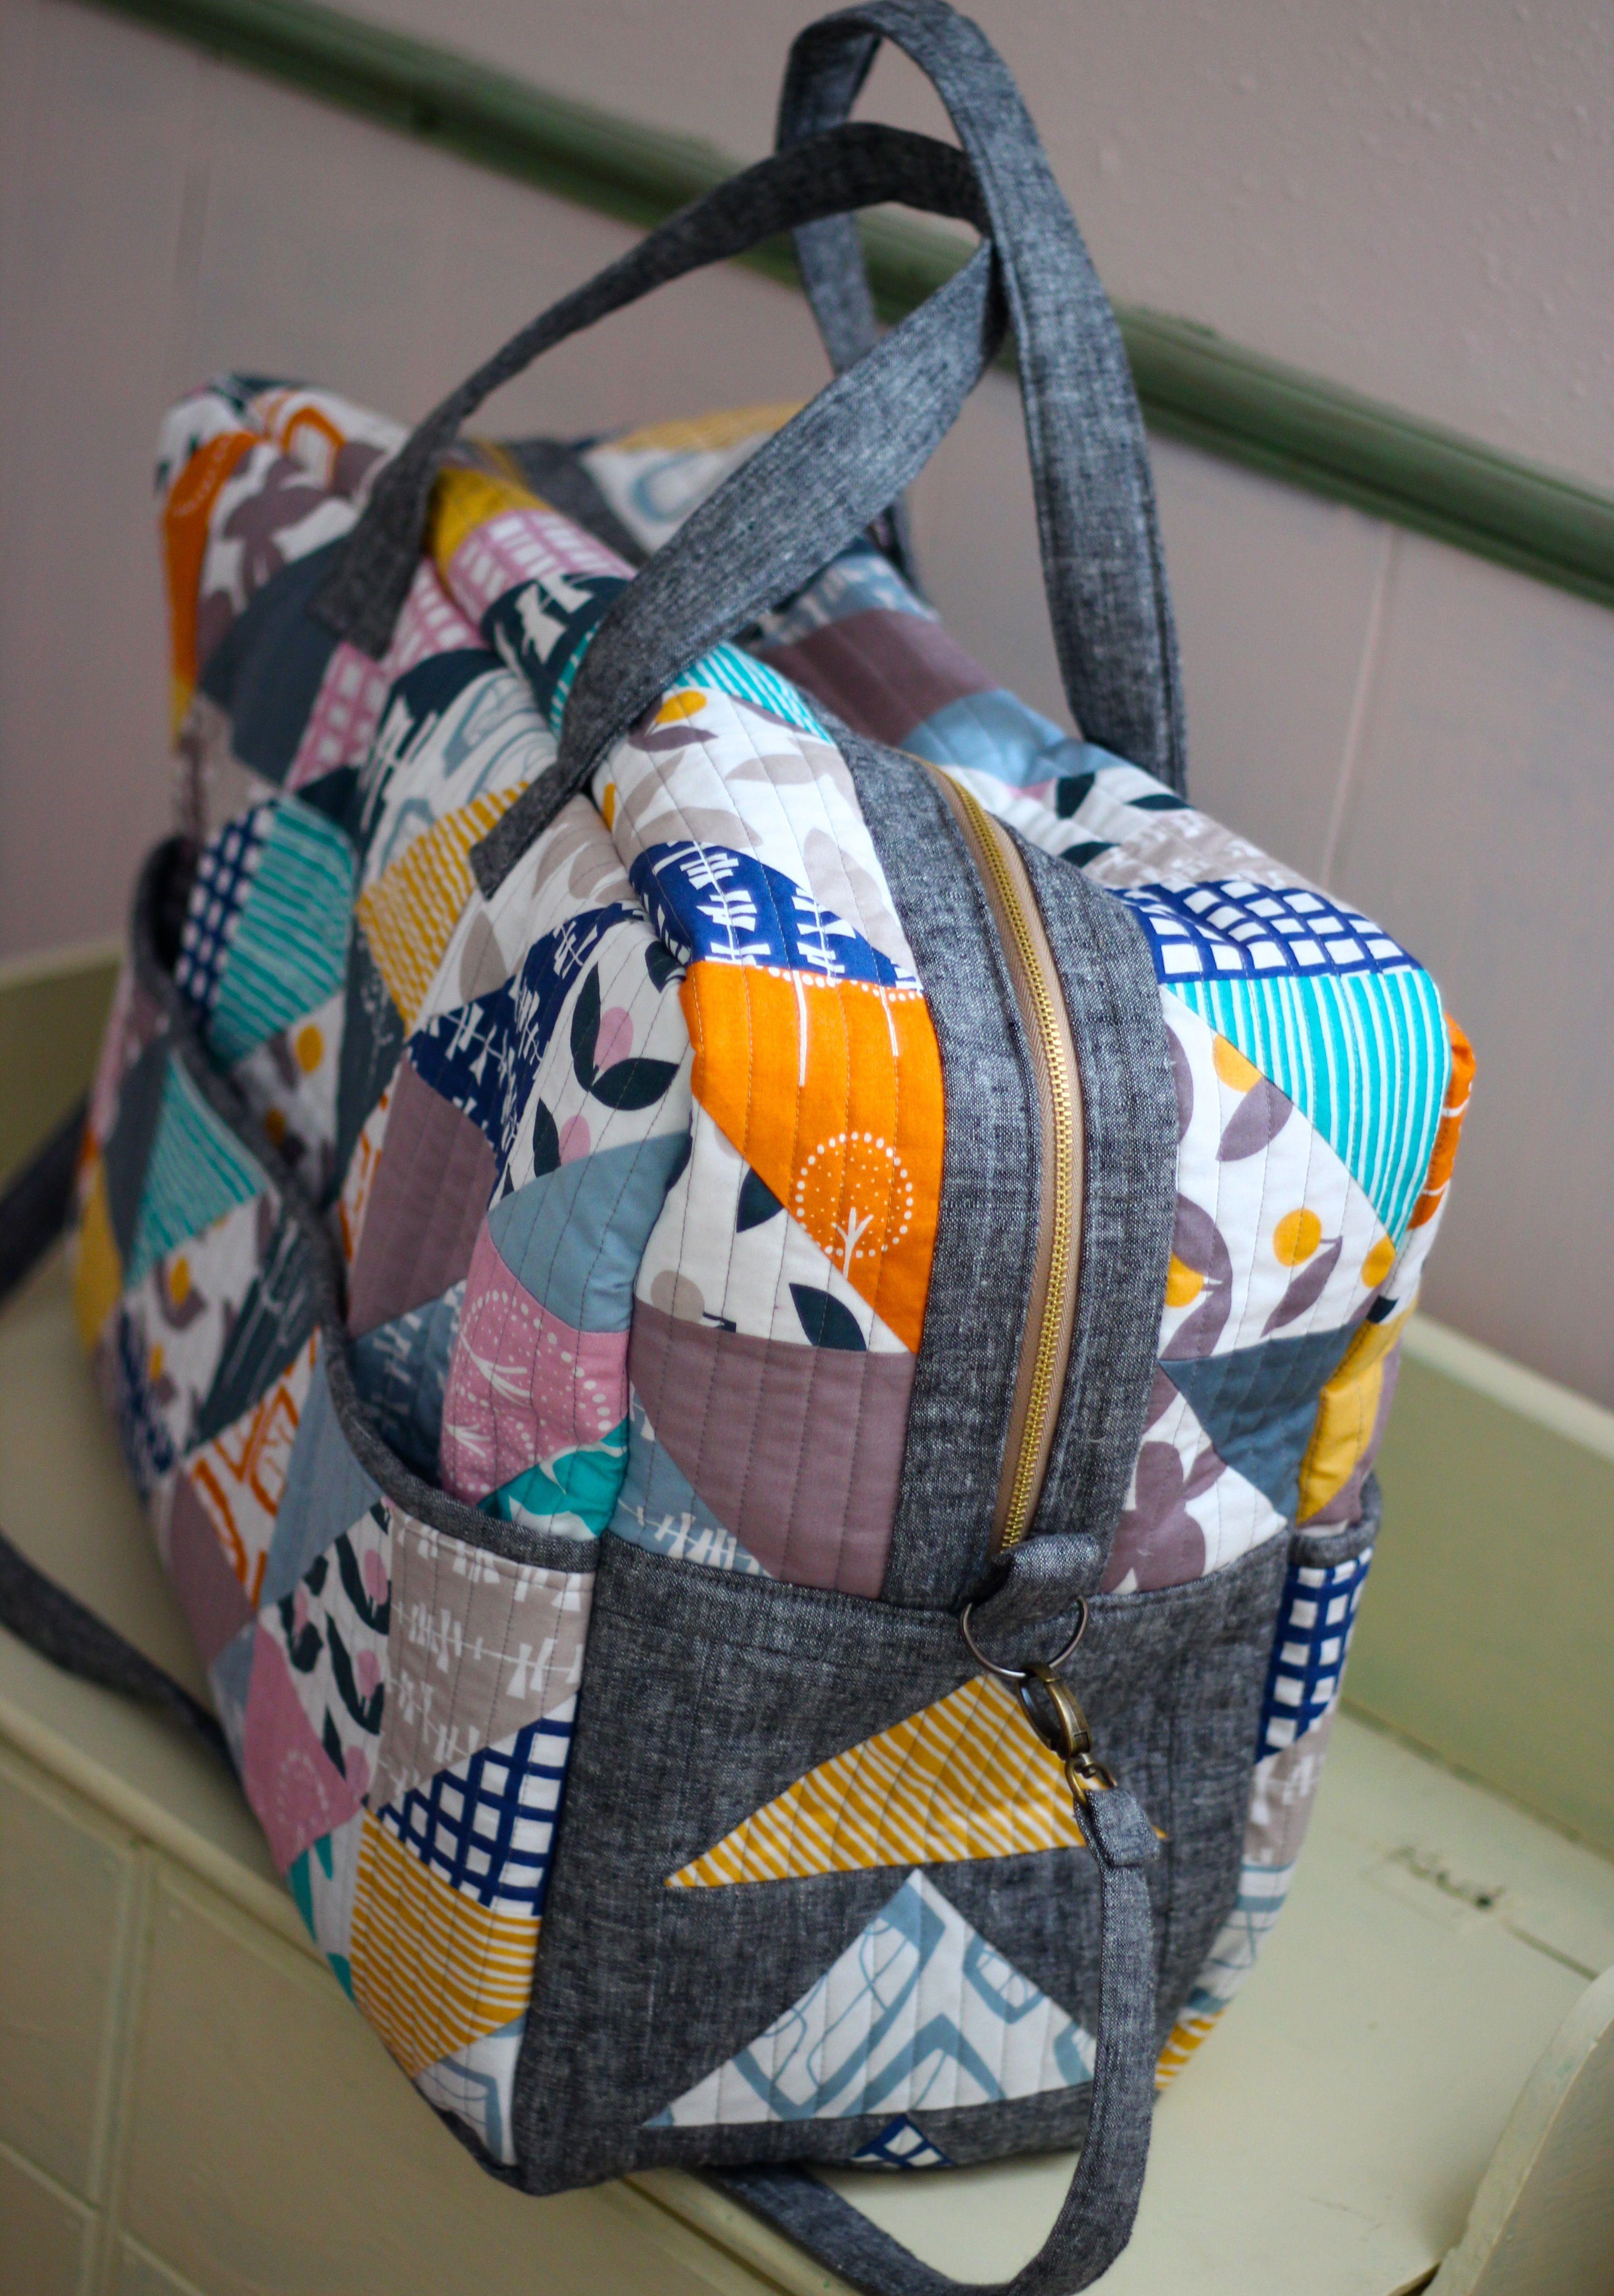 Duffle Bag Bags Patchwork Taschen Reisetasche